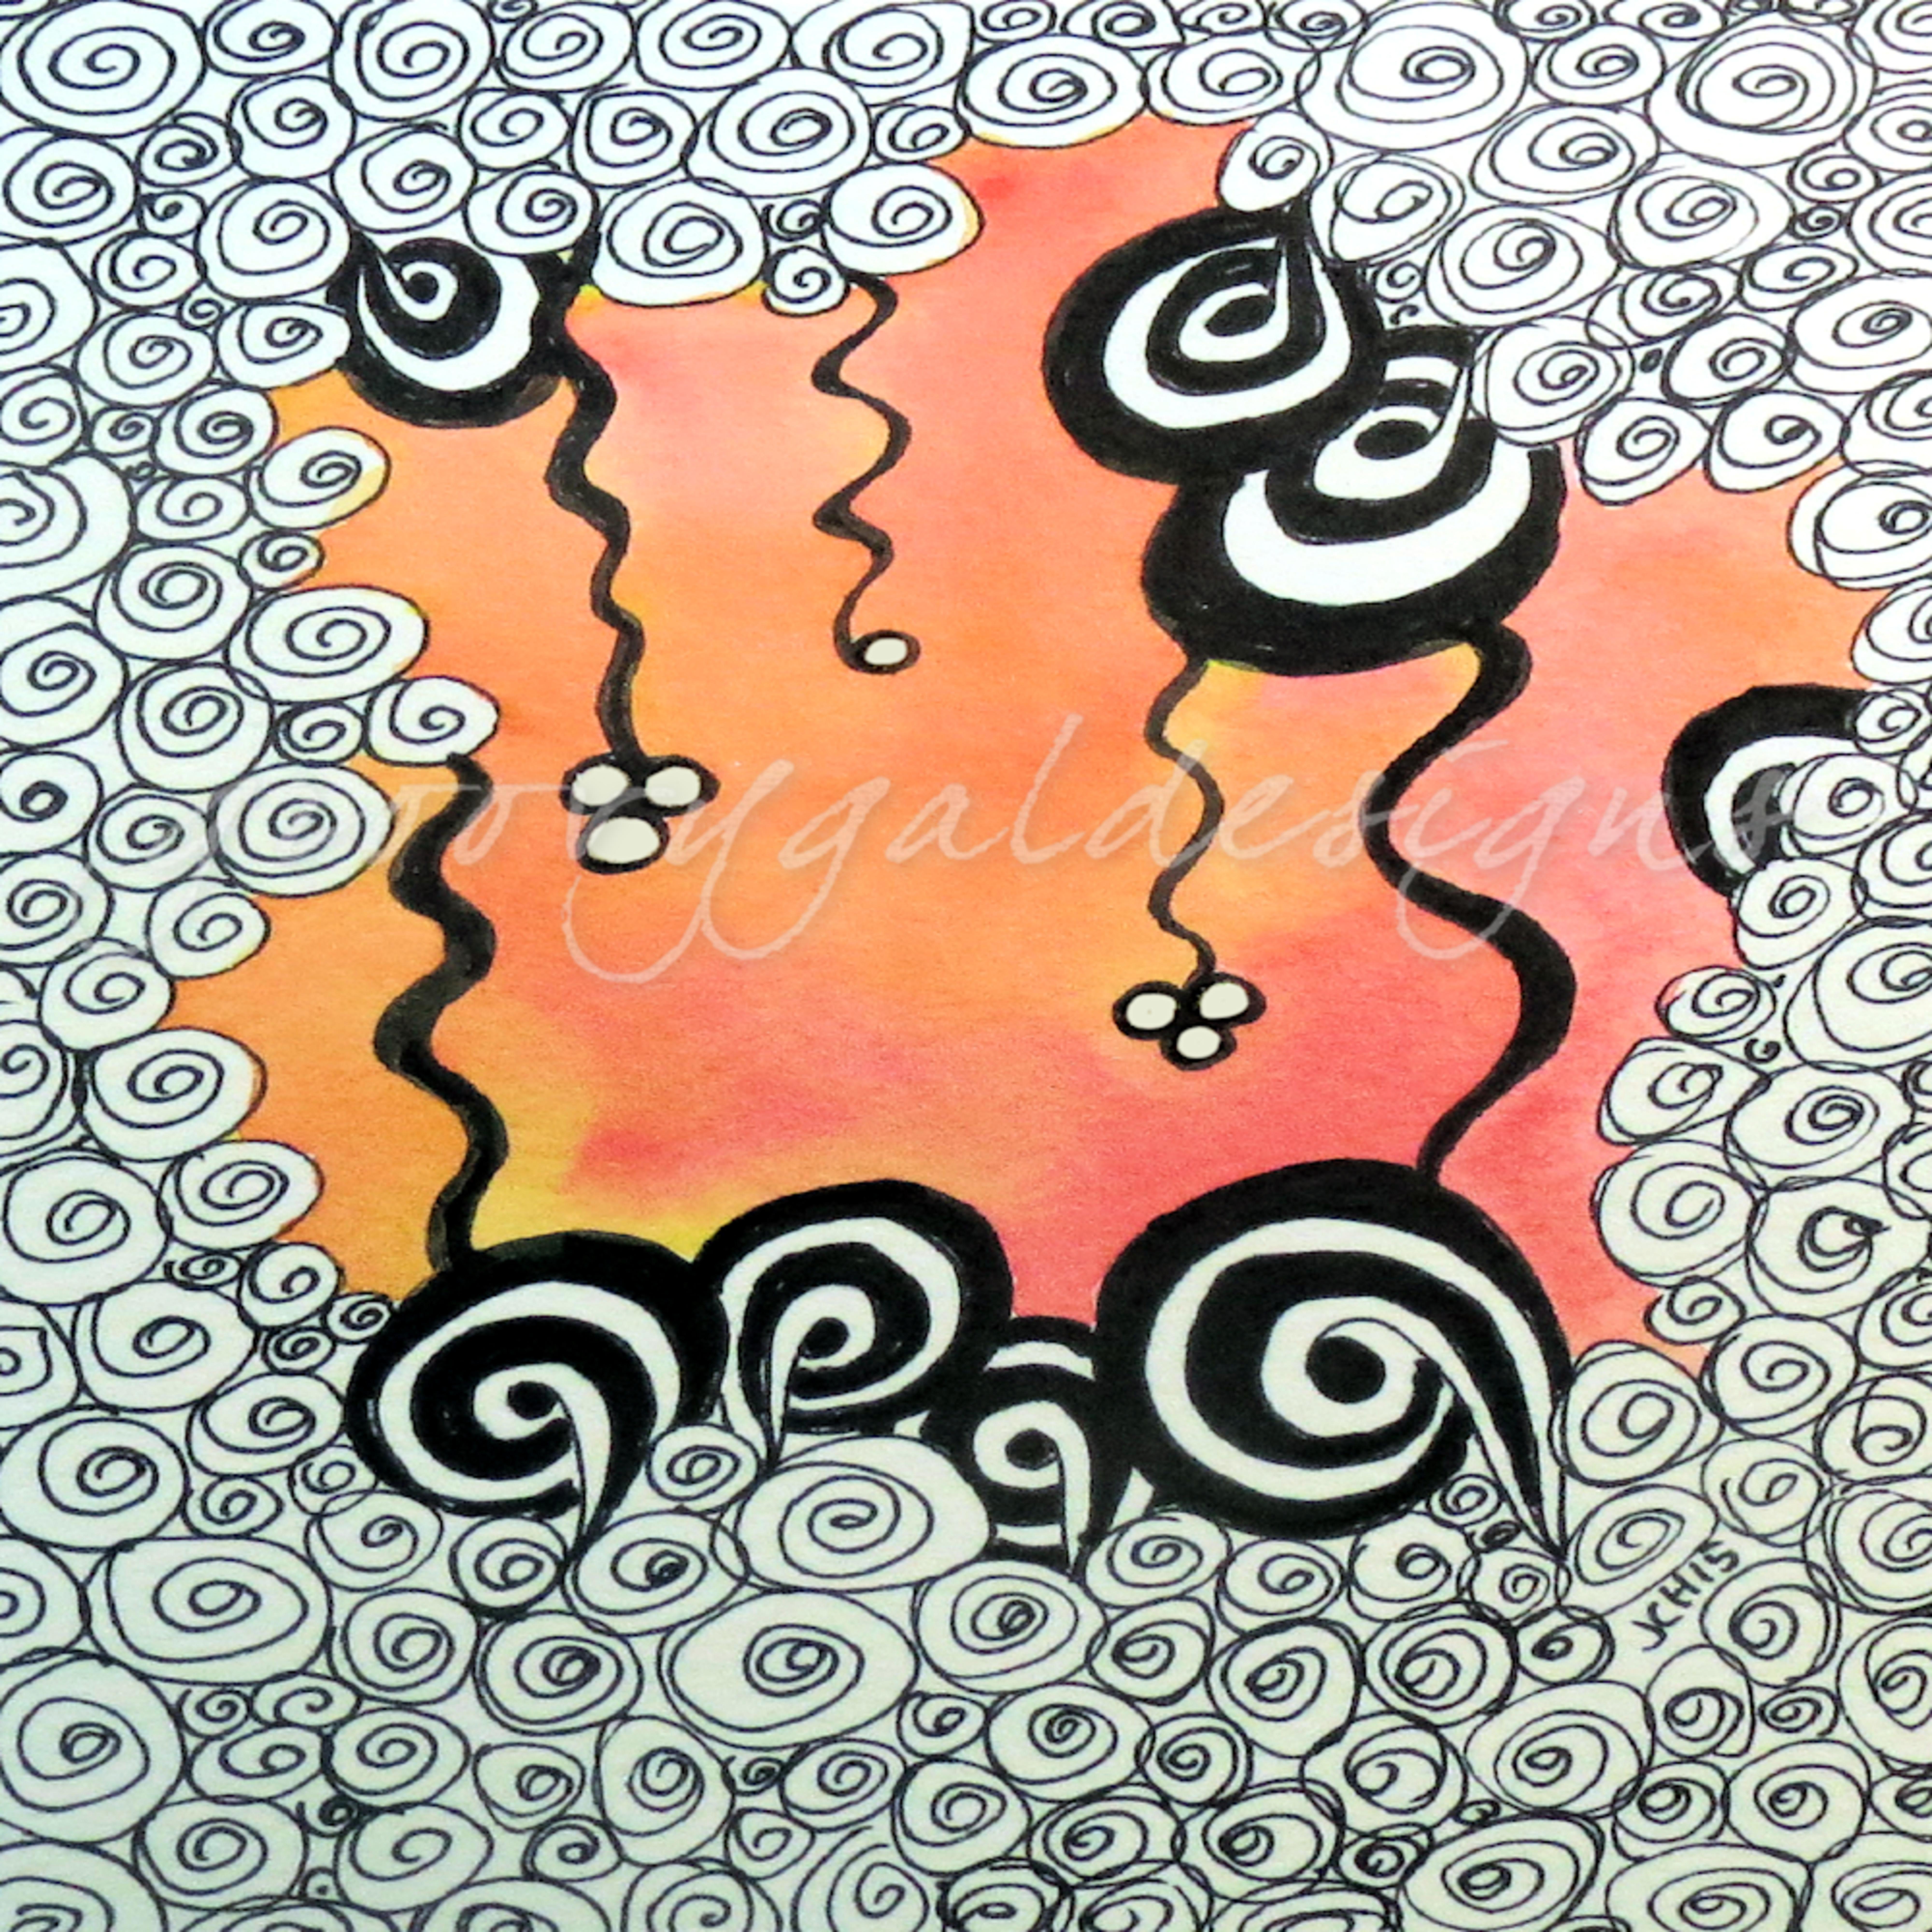 Doodle square dpljac